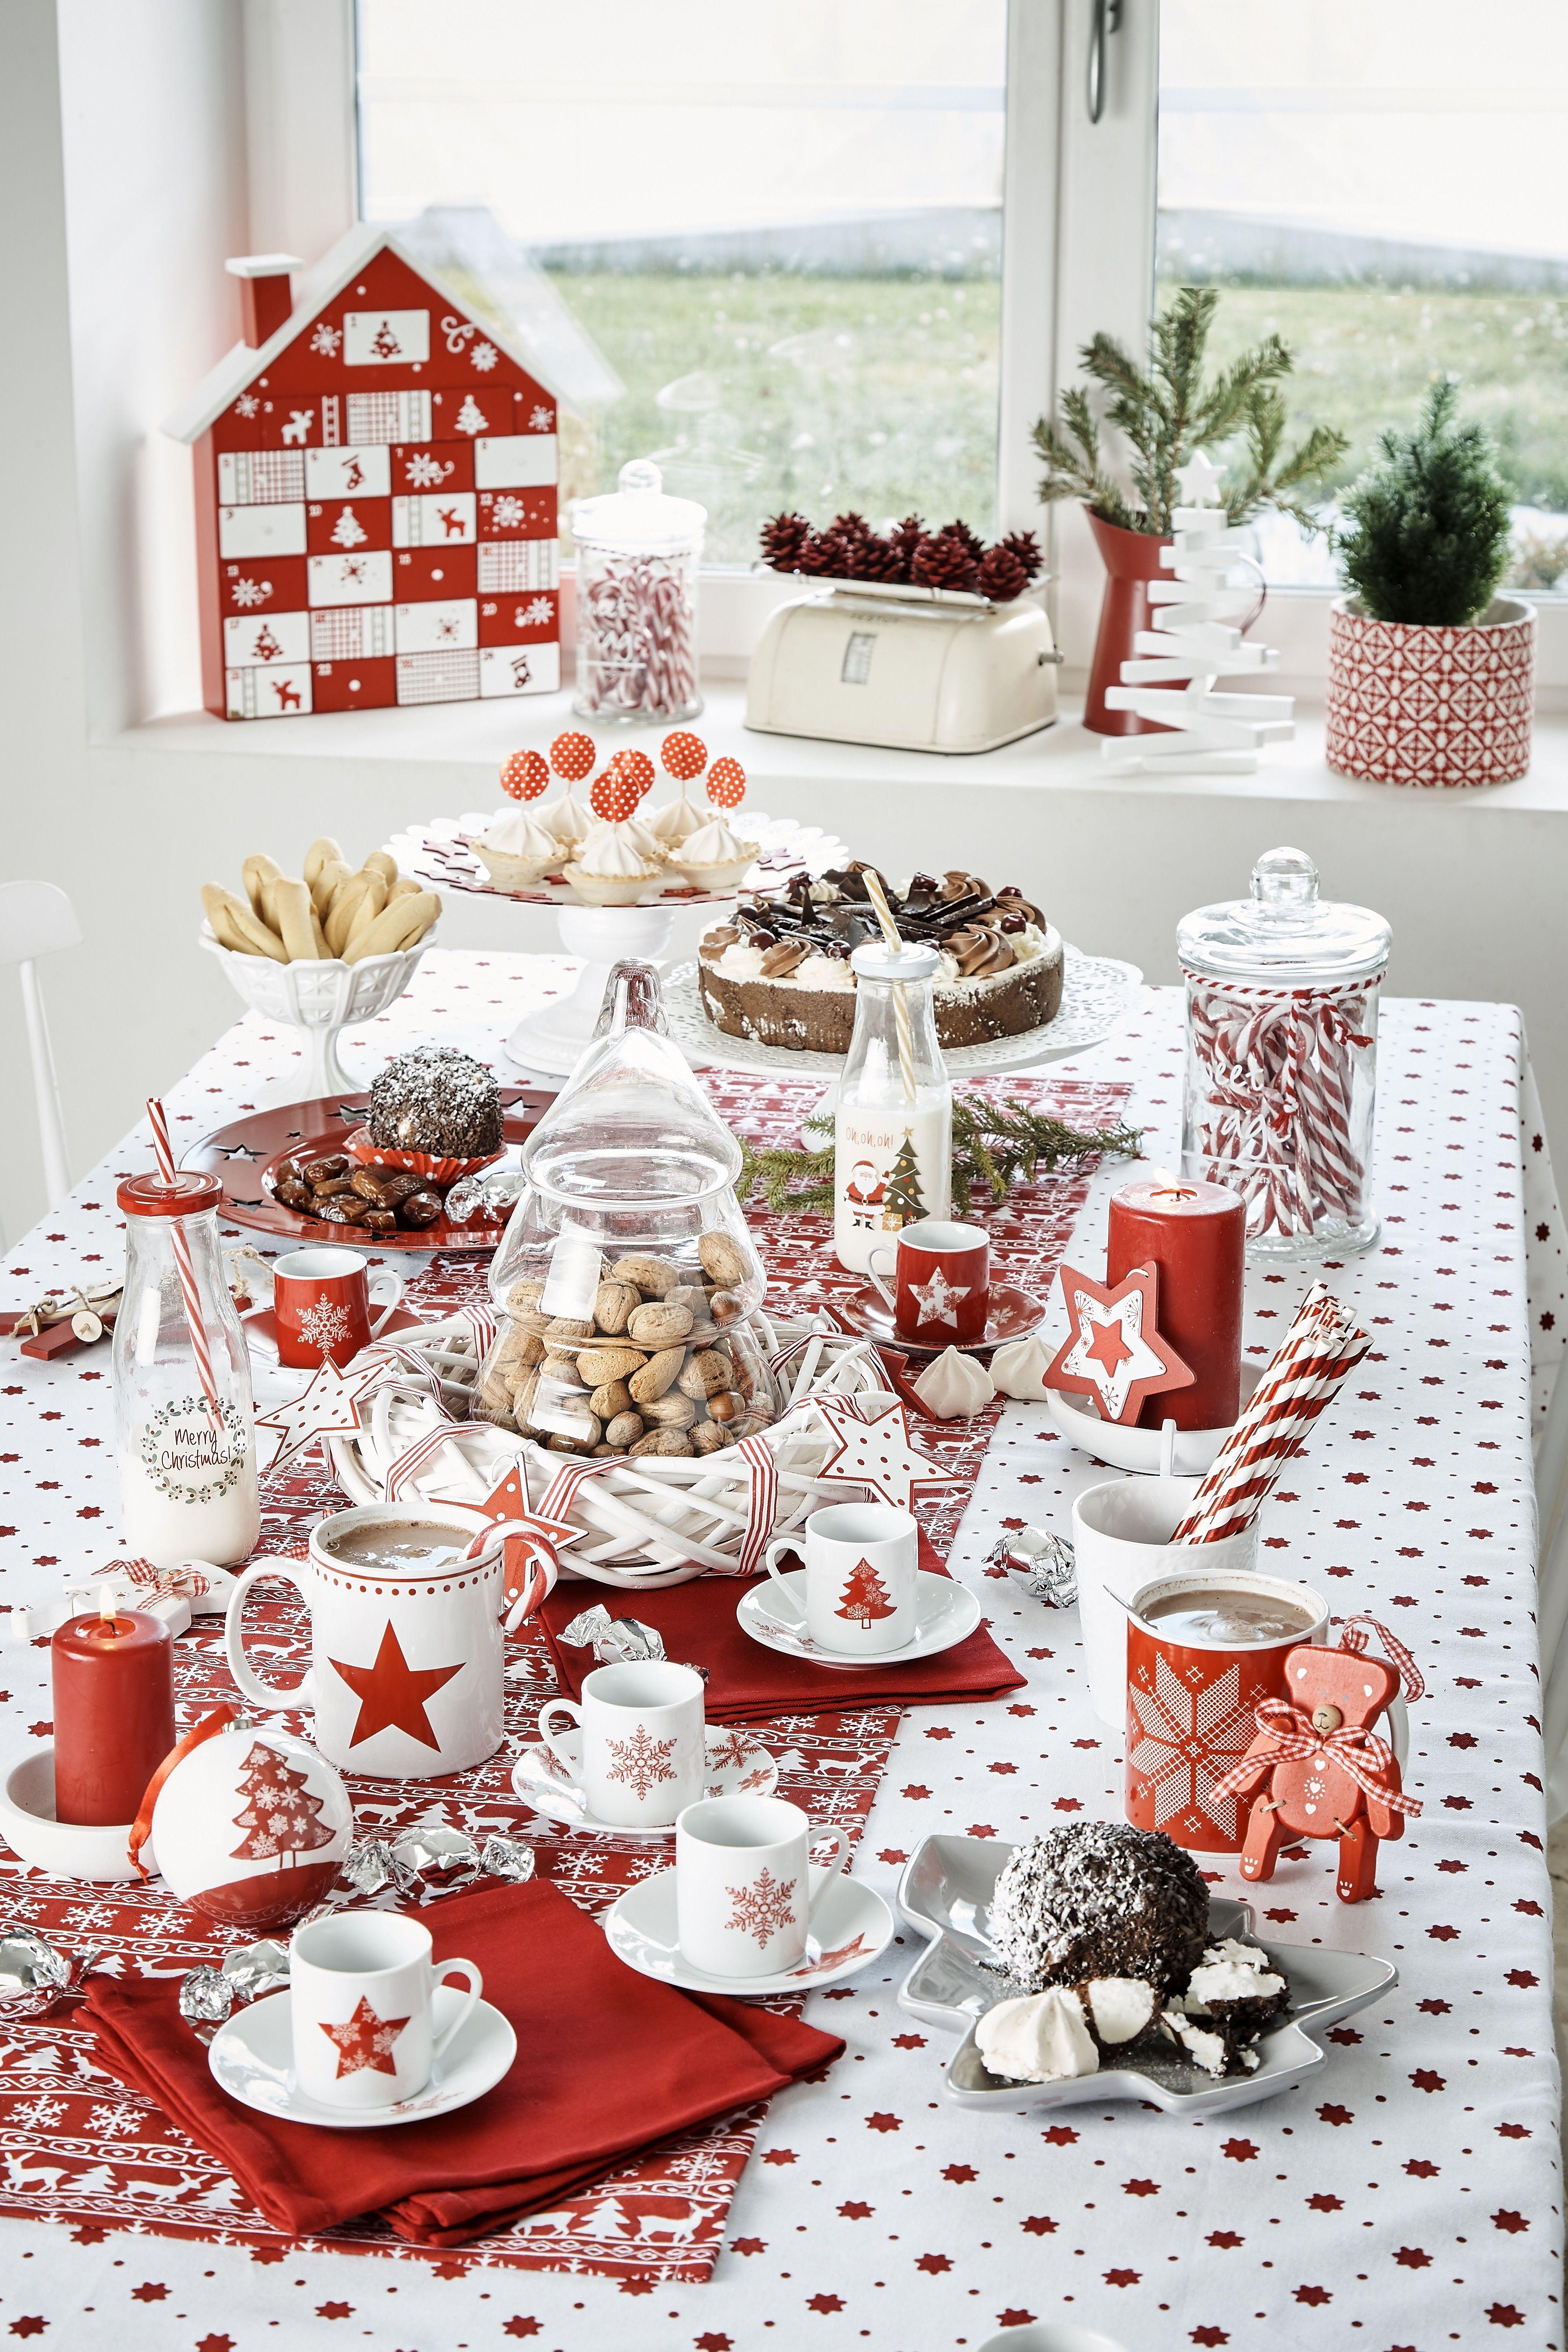 Noel Traditionnel Decoration Noel Deco Noel Gifi Deco Noel